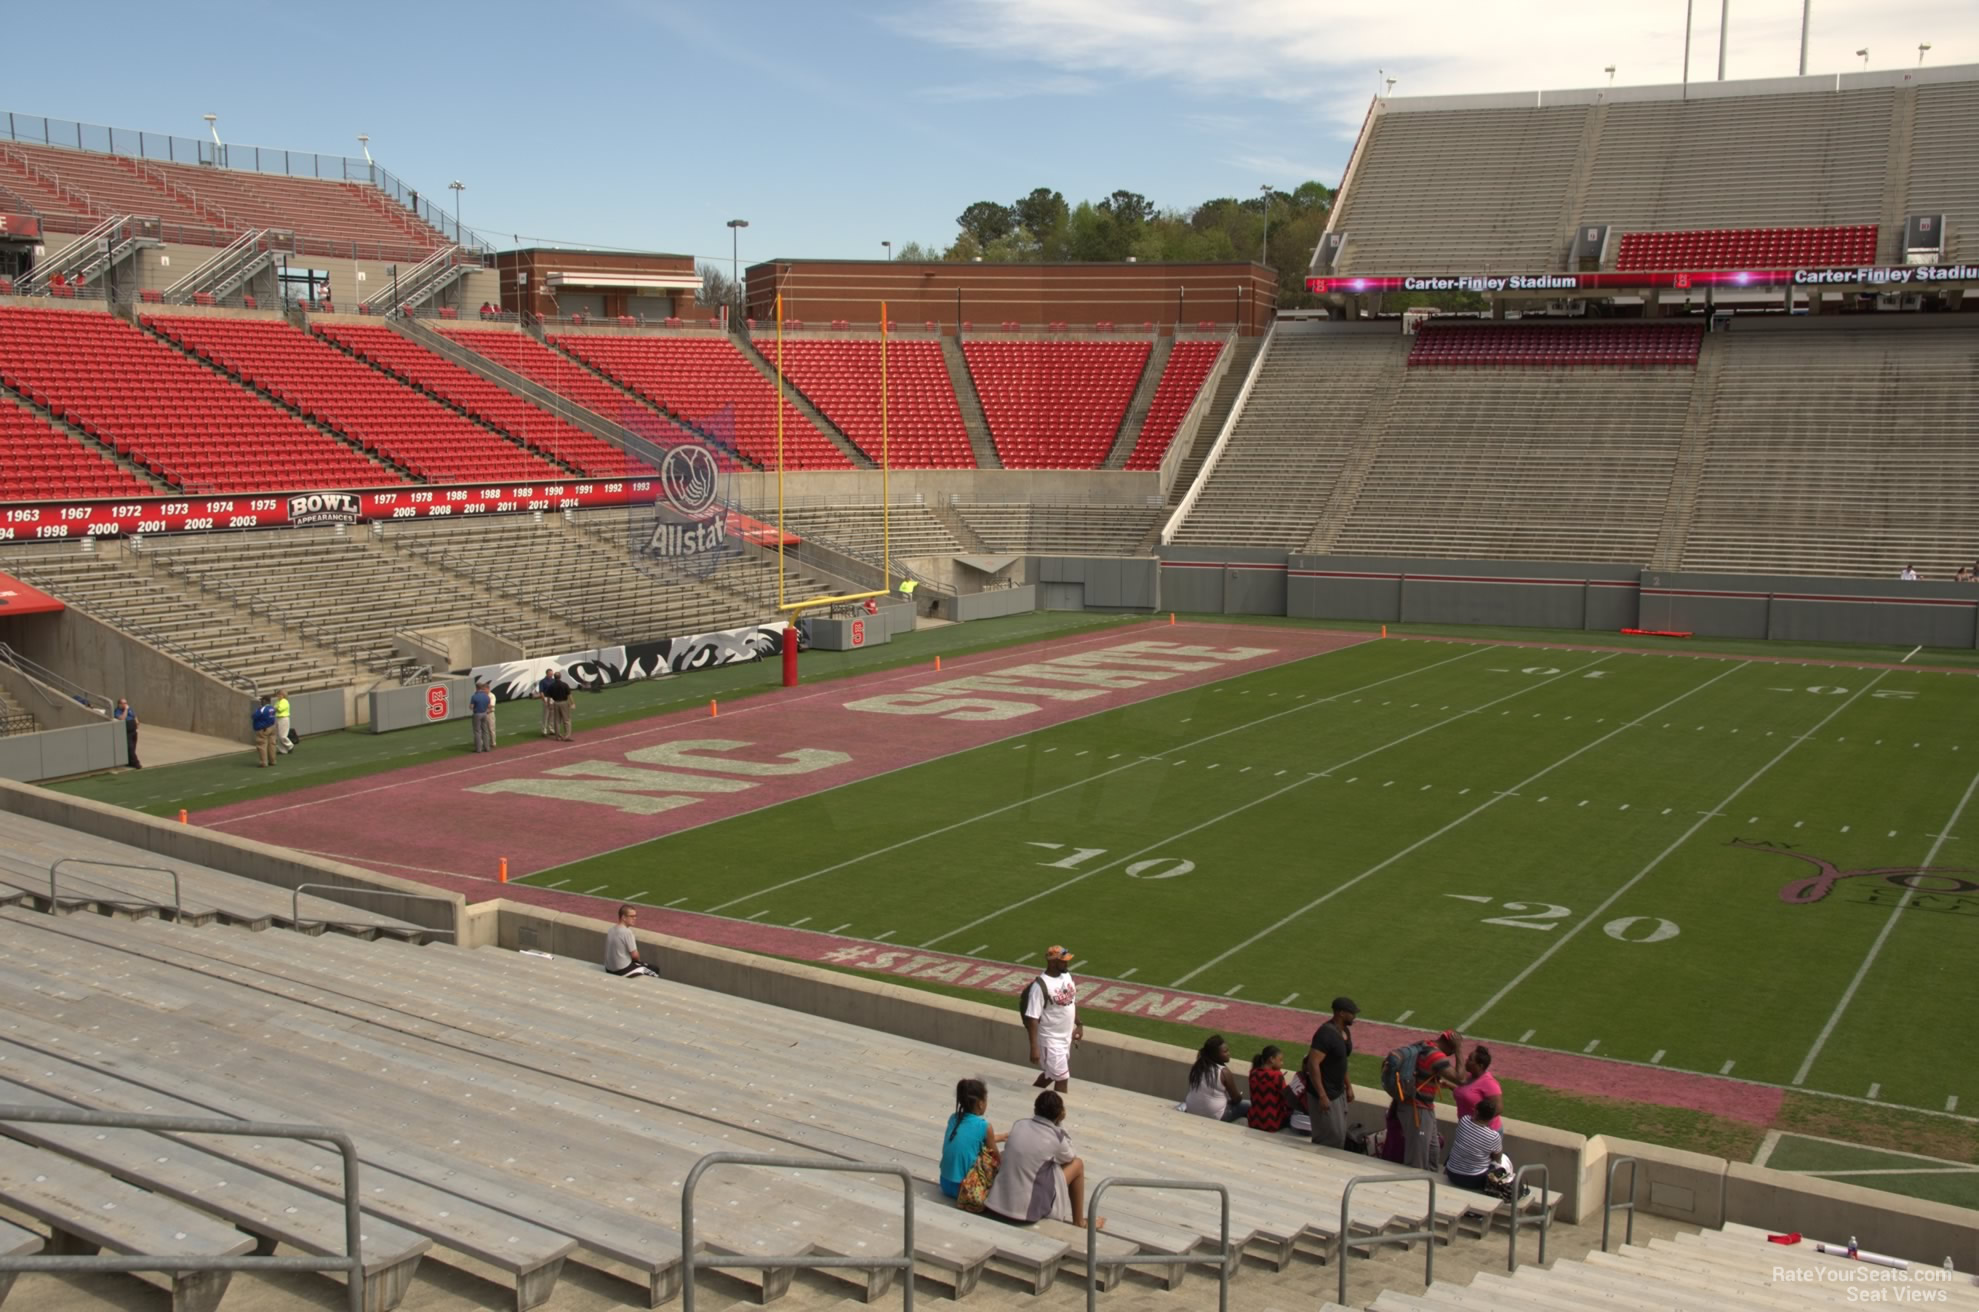 Carter finley stadium section 22 rateyourseats com